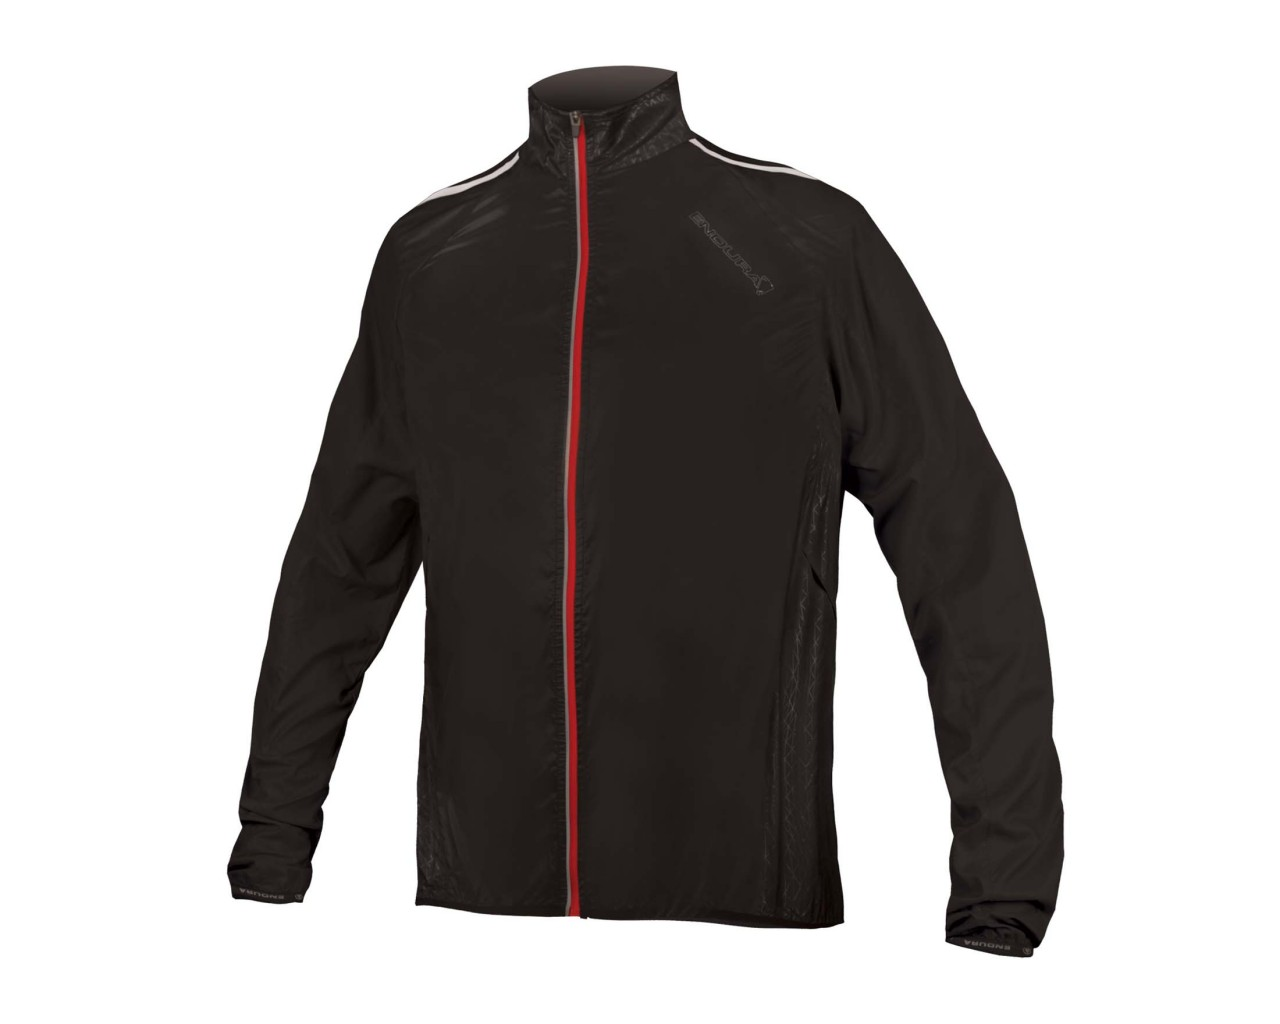 Endura Pakajak II Jacke mit Windschutz   black